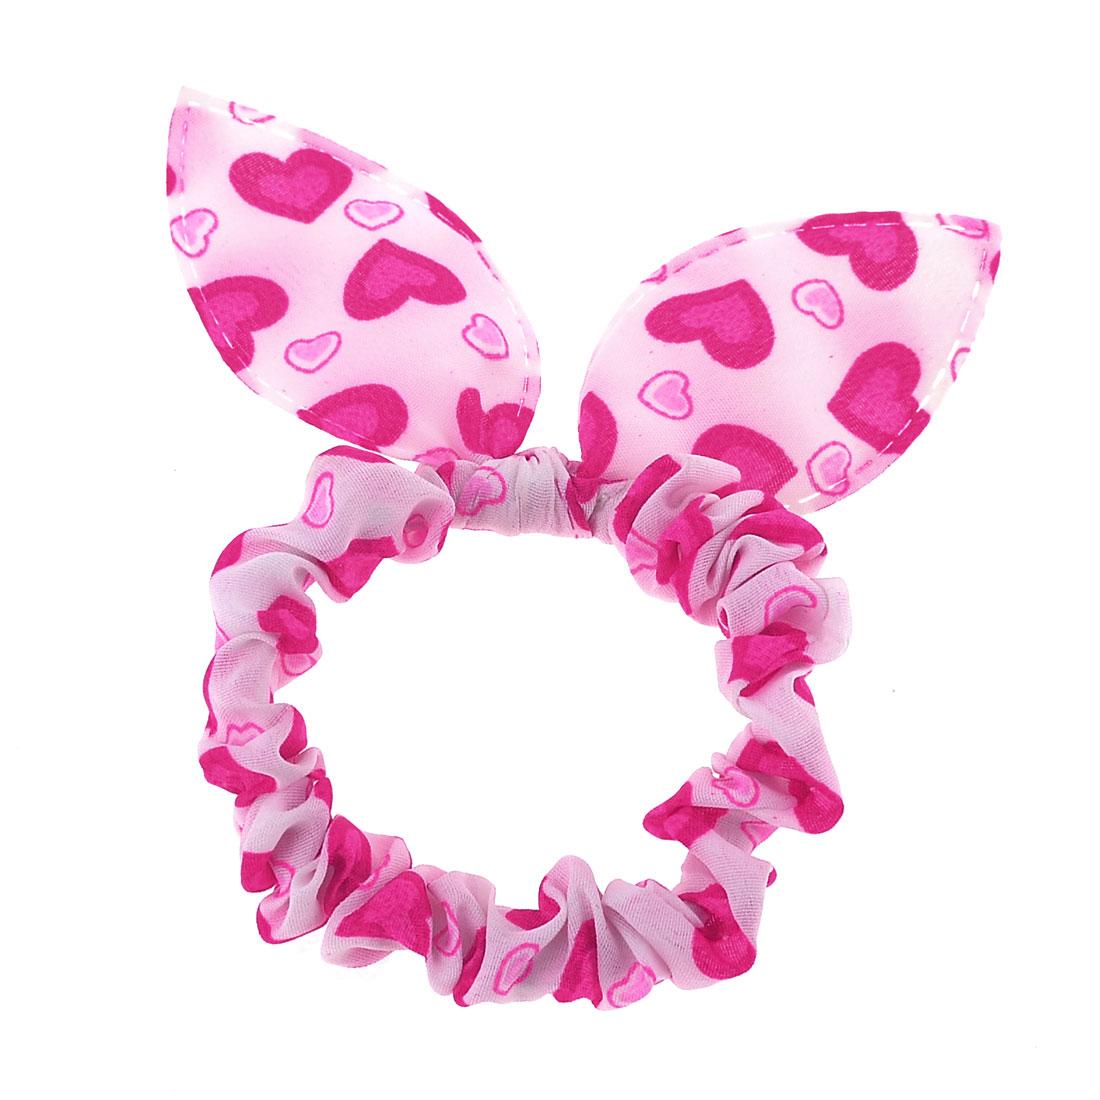 Fuchsia Hearts Print Rabbit Ear Stretch Hair Tie Ponytail Holder White for Girls